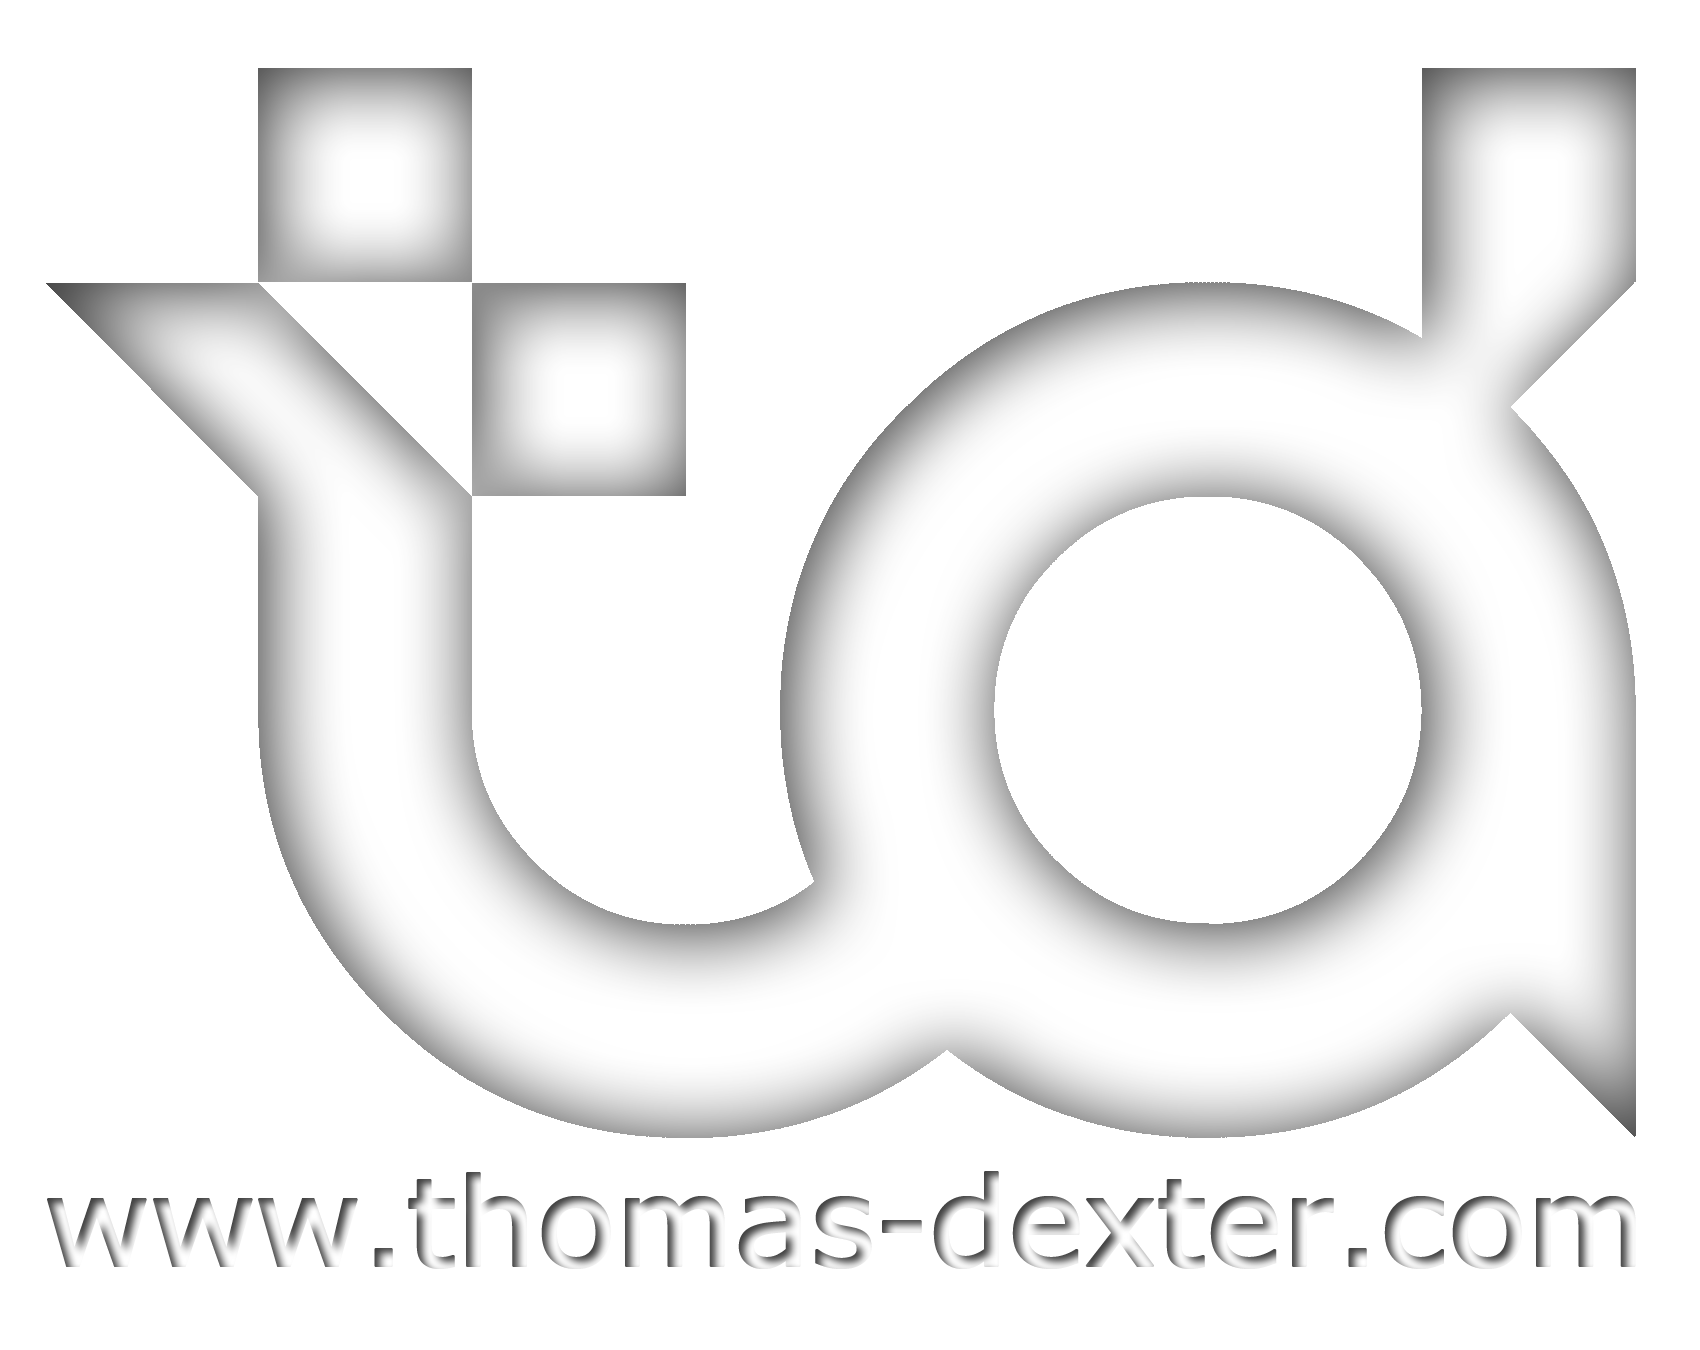 td_logo_transparent_white